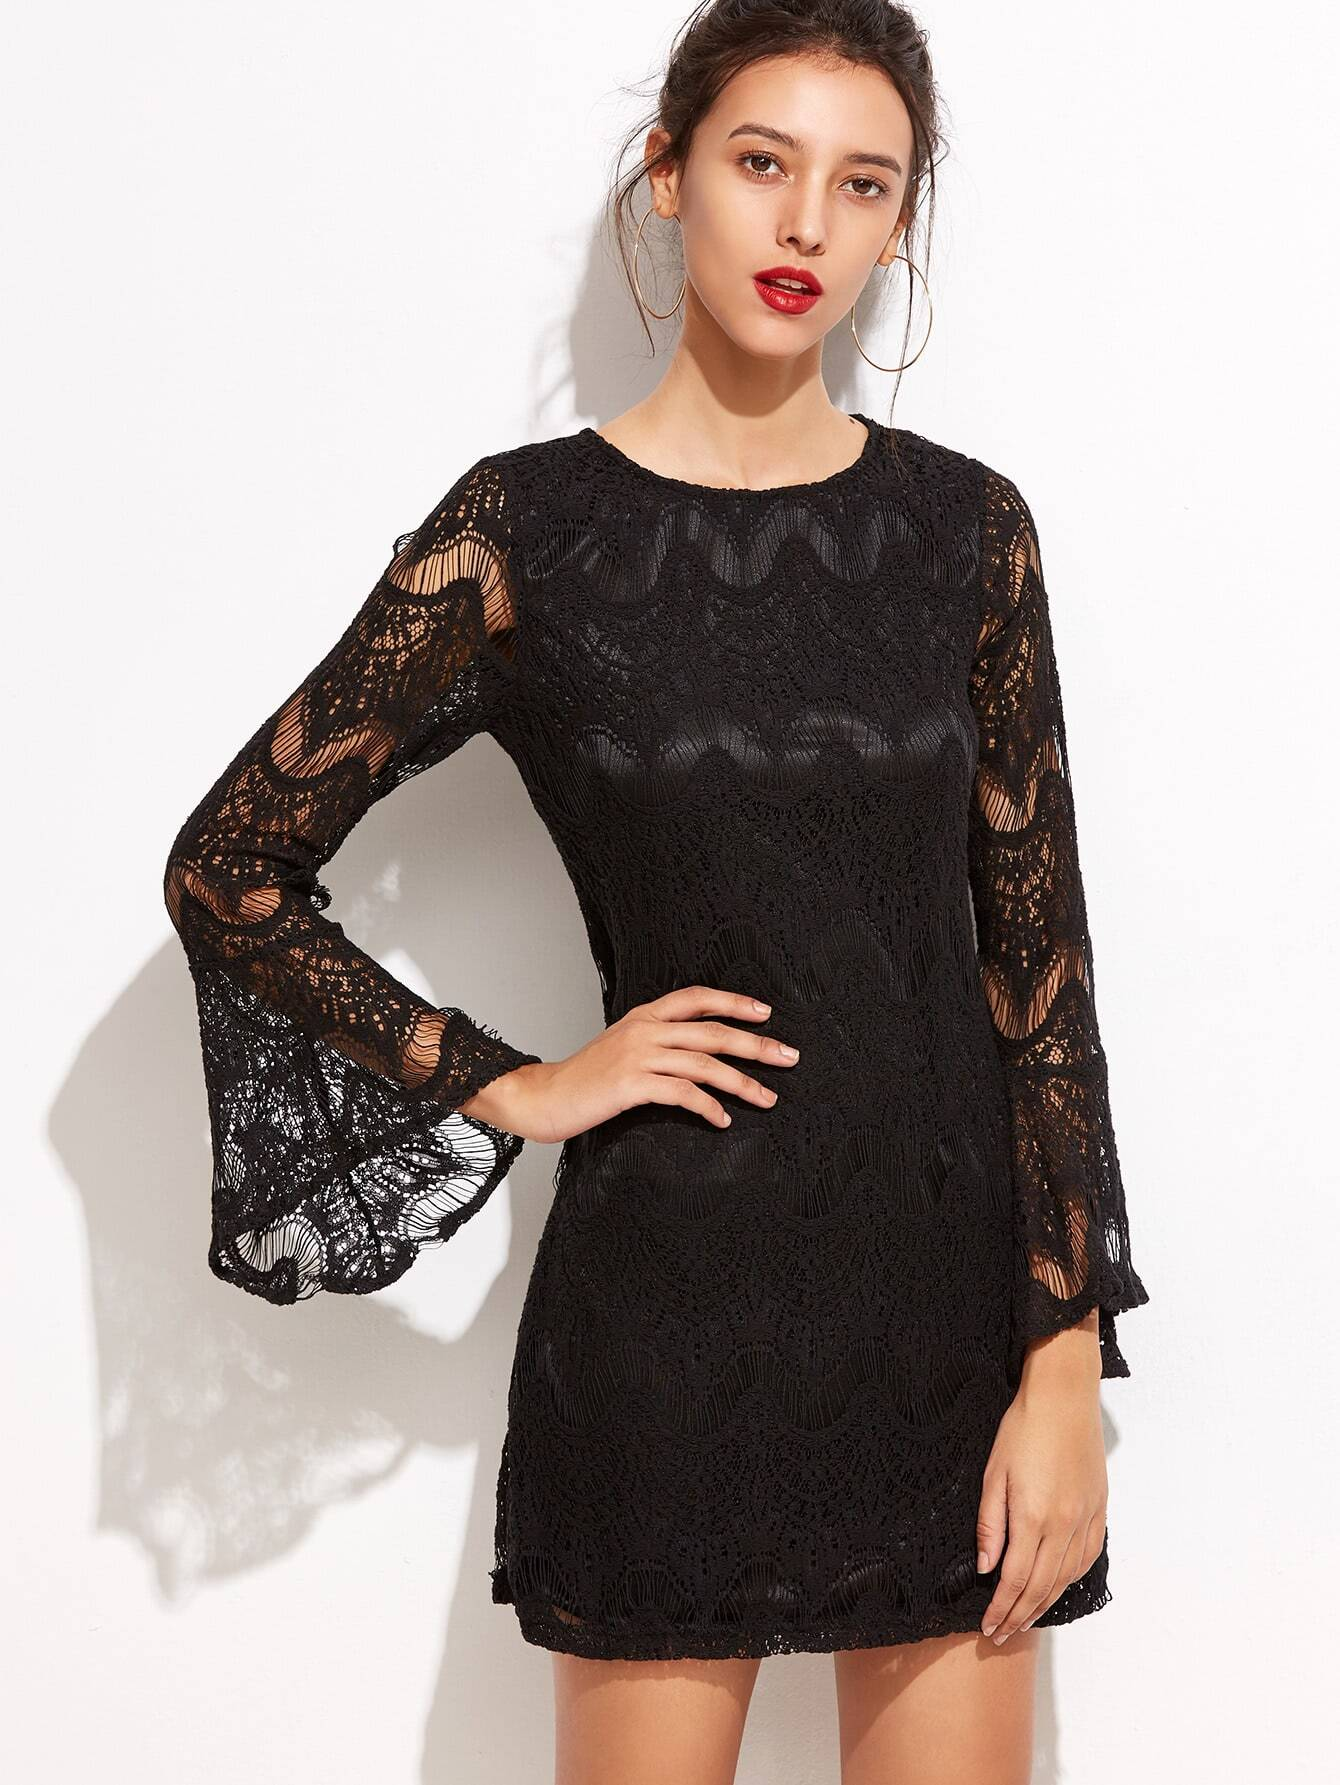 Black Bell Sleeve Lace Zipper Back DressBlack Bell Sleeve Lace Zipper Back Dress<br><br>color: Black<br>size: L,M,S,XL